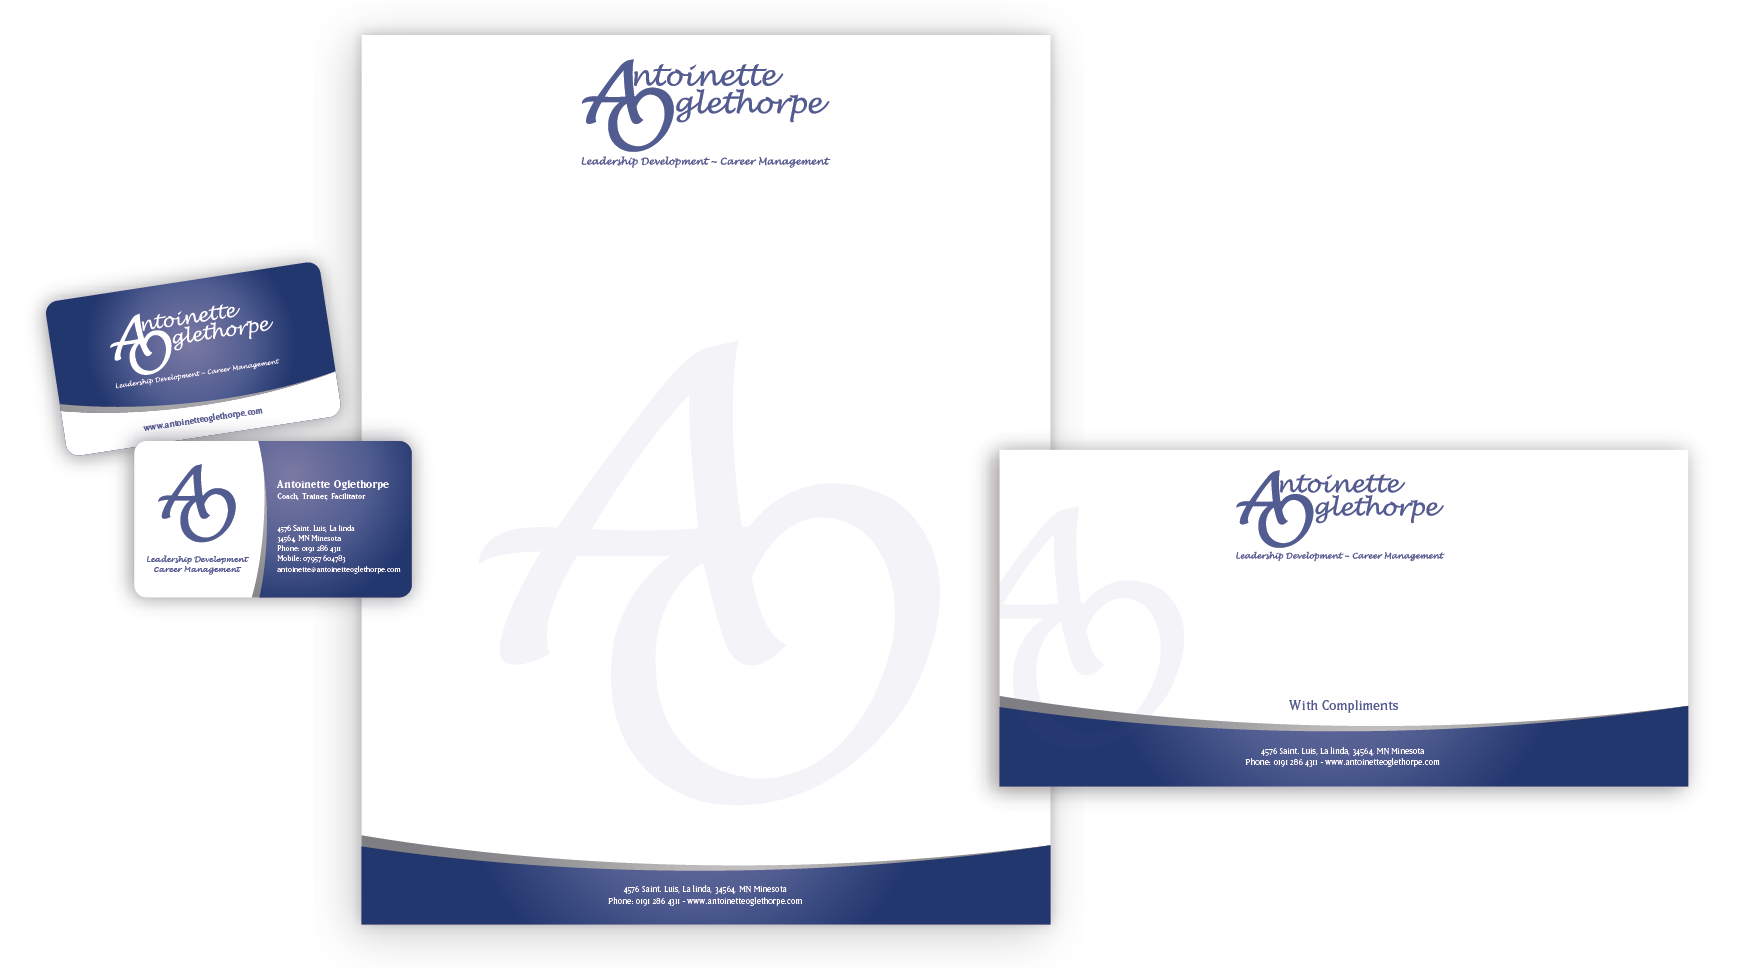 New stationery wanted for Antoinette Oglethorpe Ltd